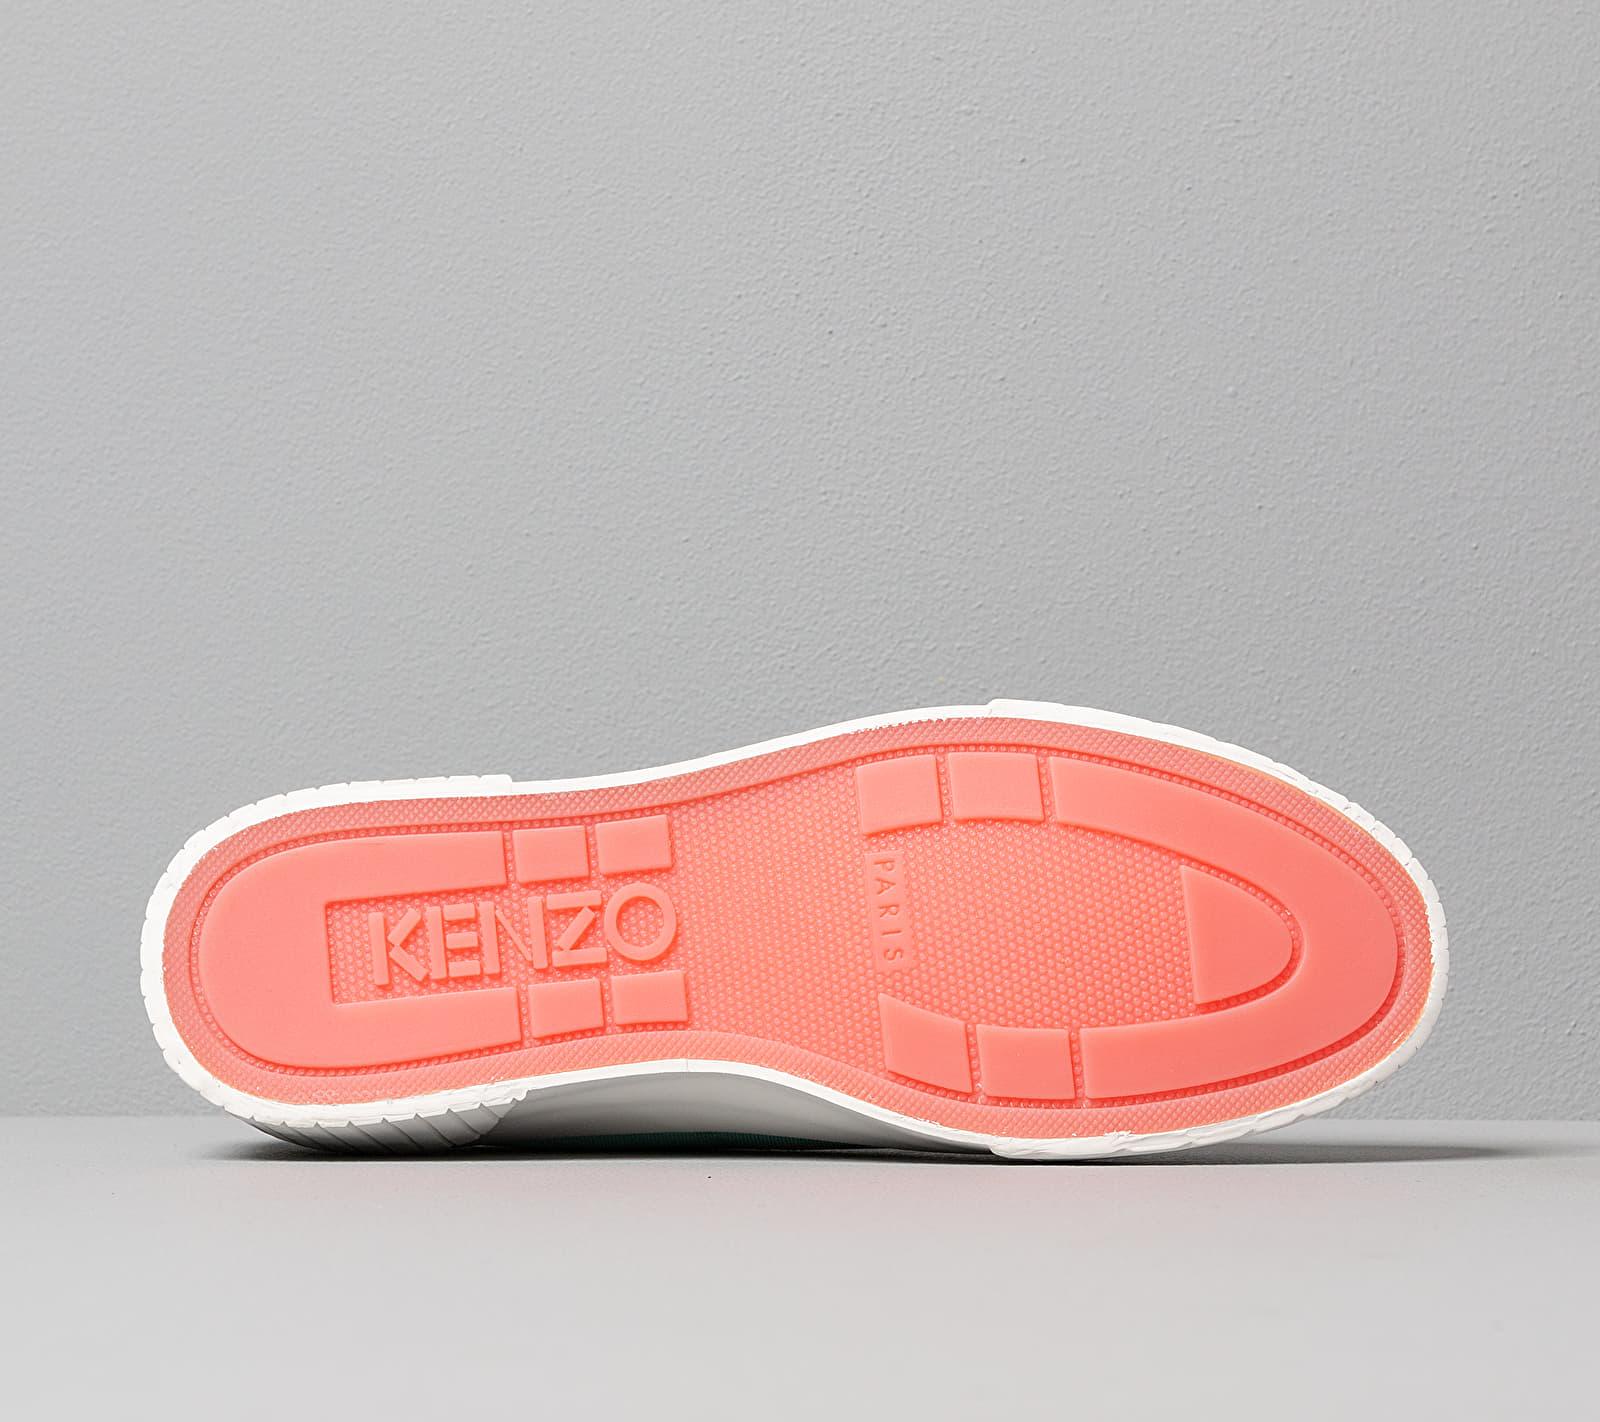 Kenzo Volkano Low Top Sneakers Aqua, Green